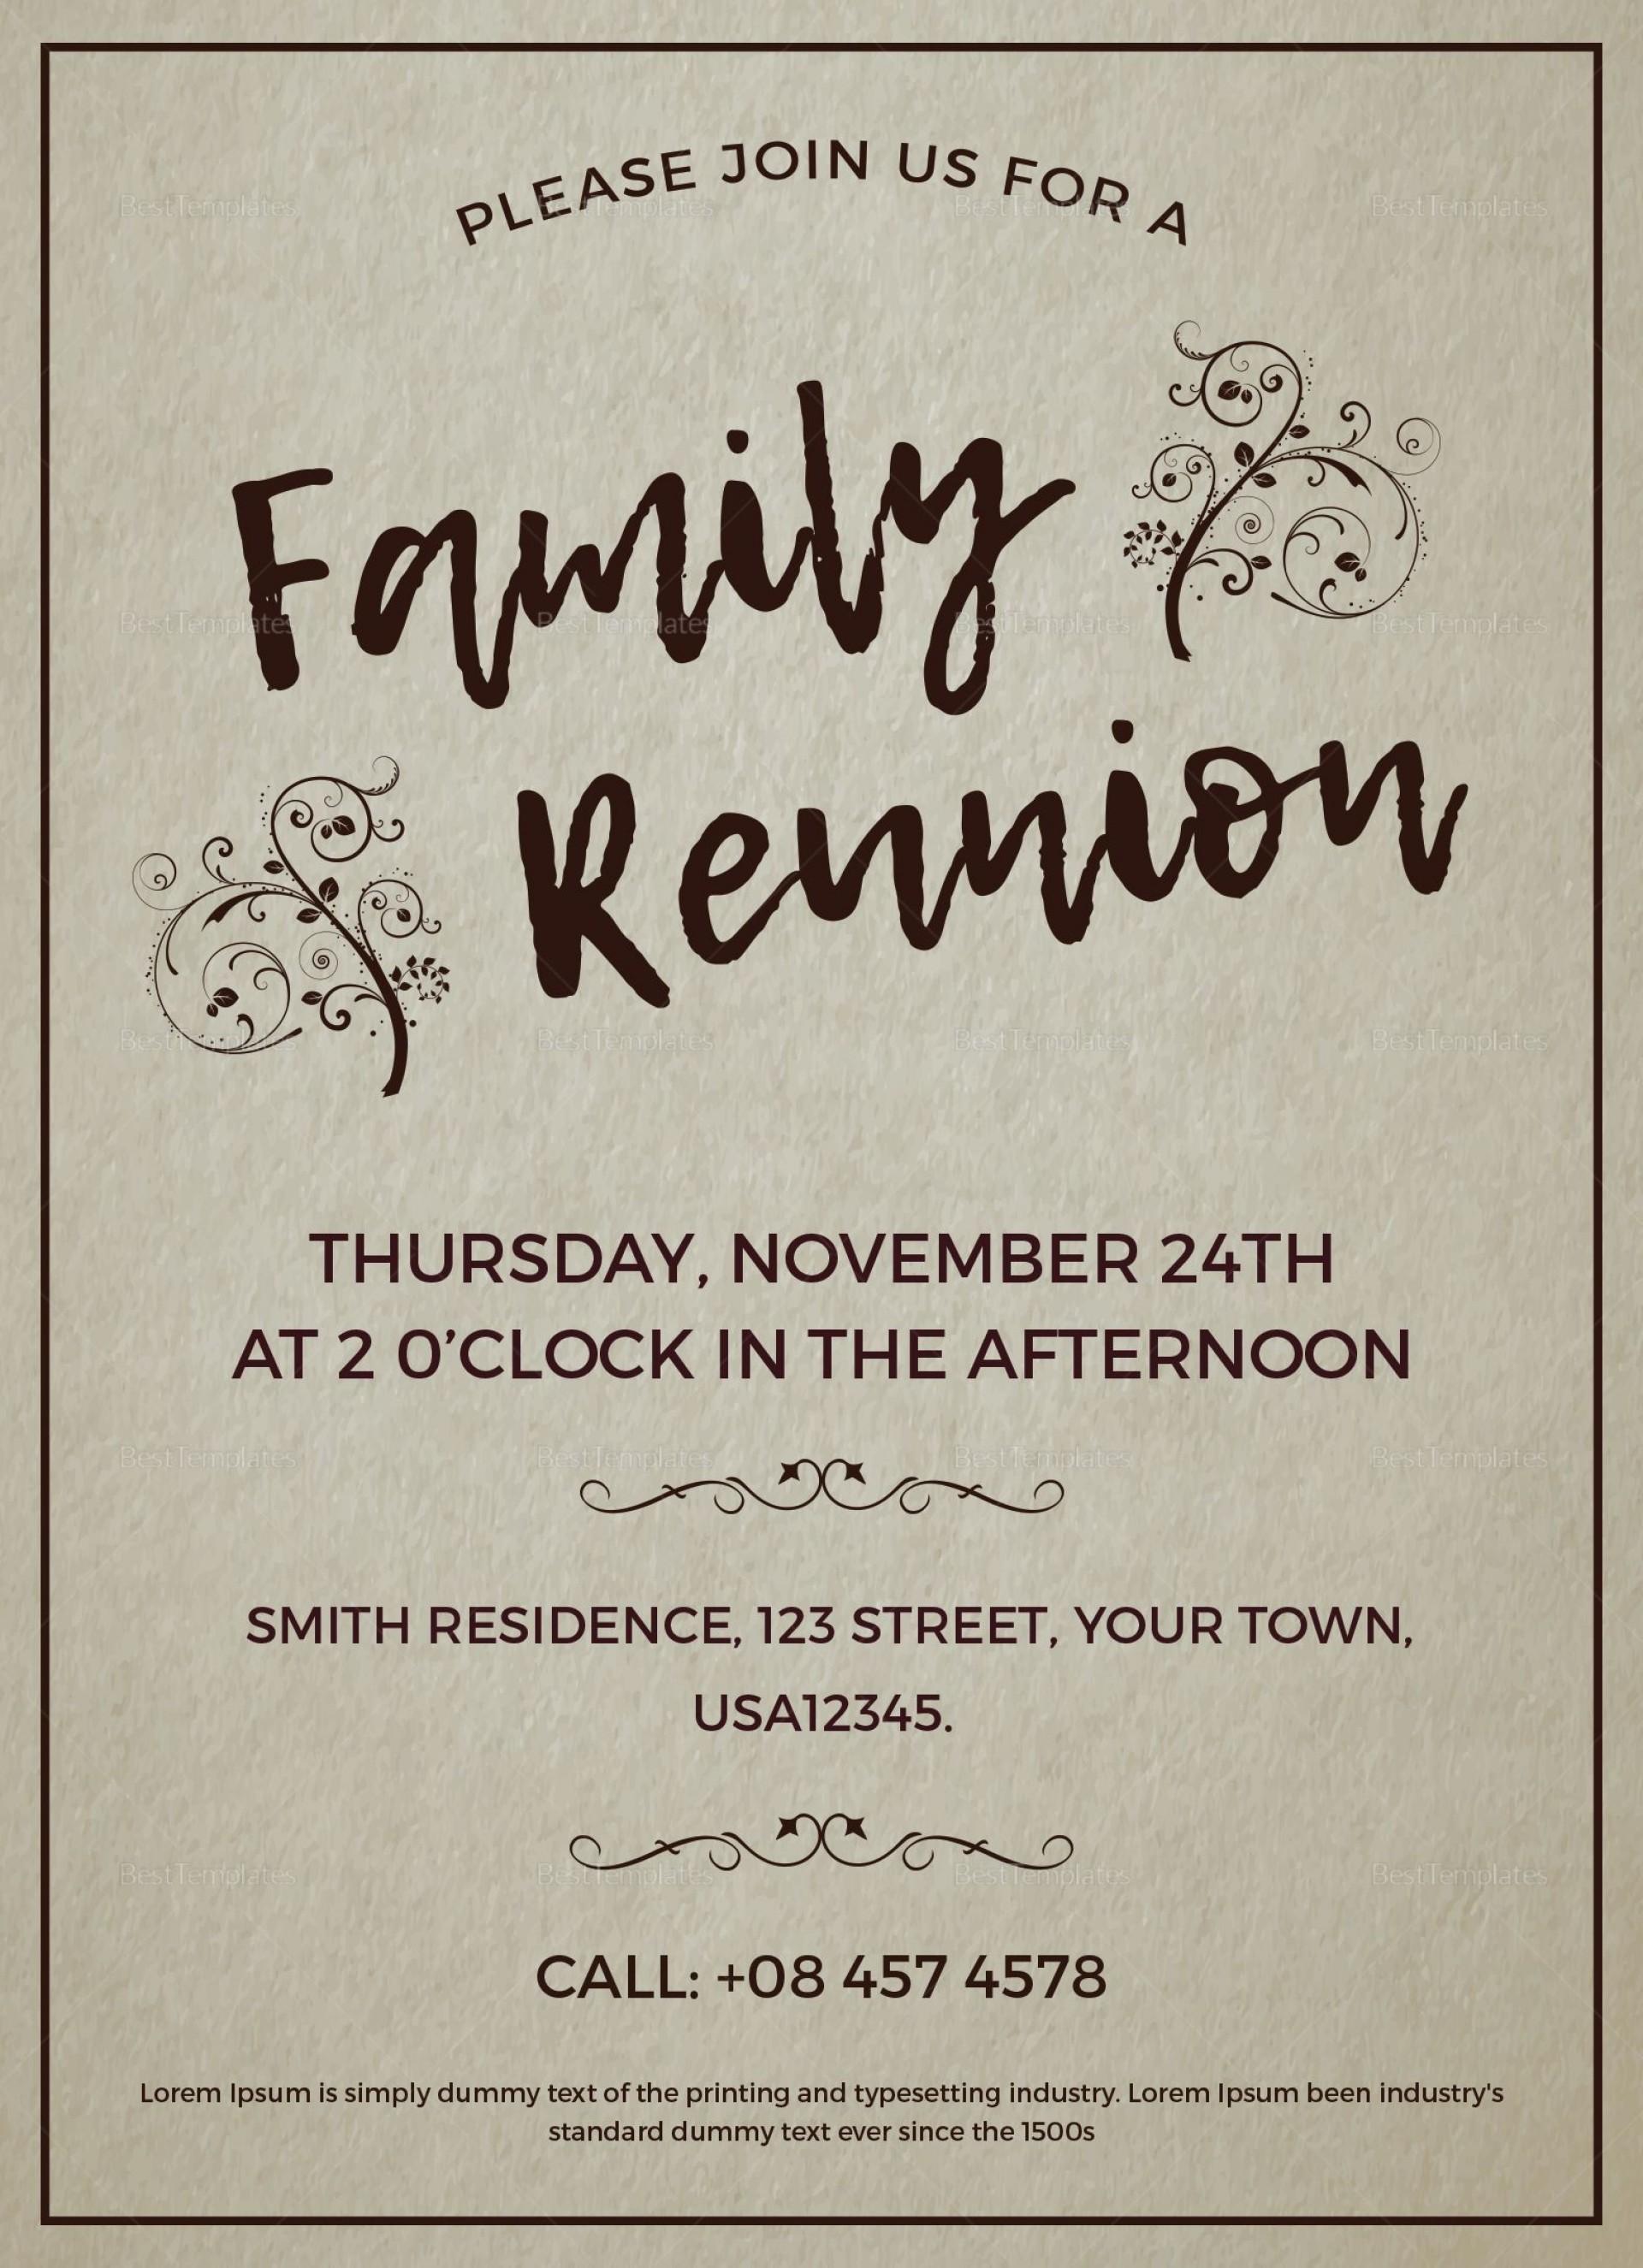 002 Imposing Free Printable Family Reunion Invitation Template Photo  Templates Flyer1920